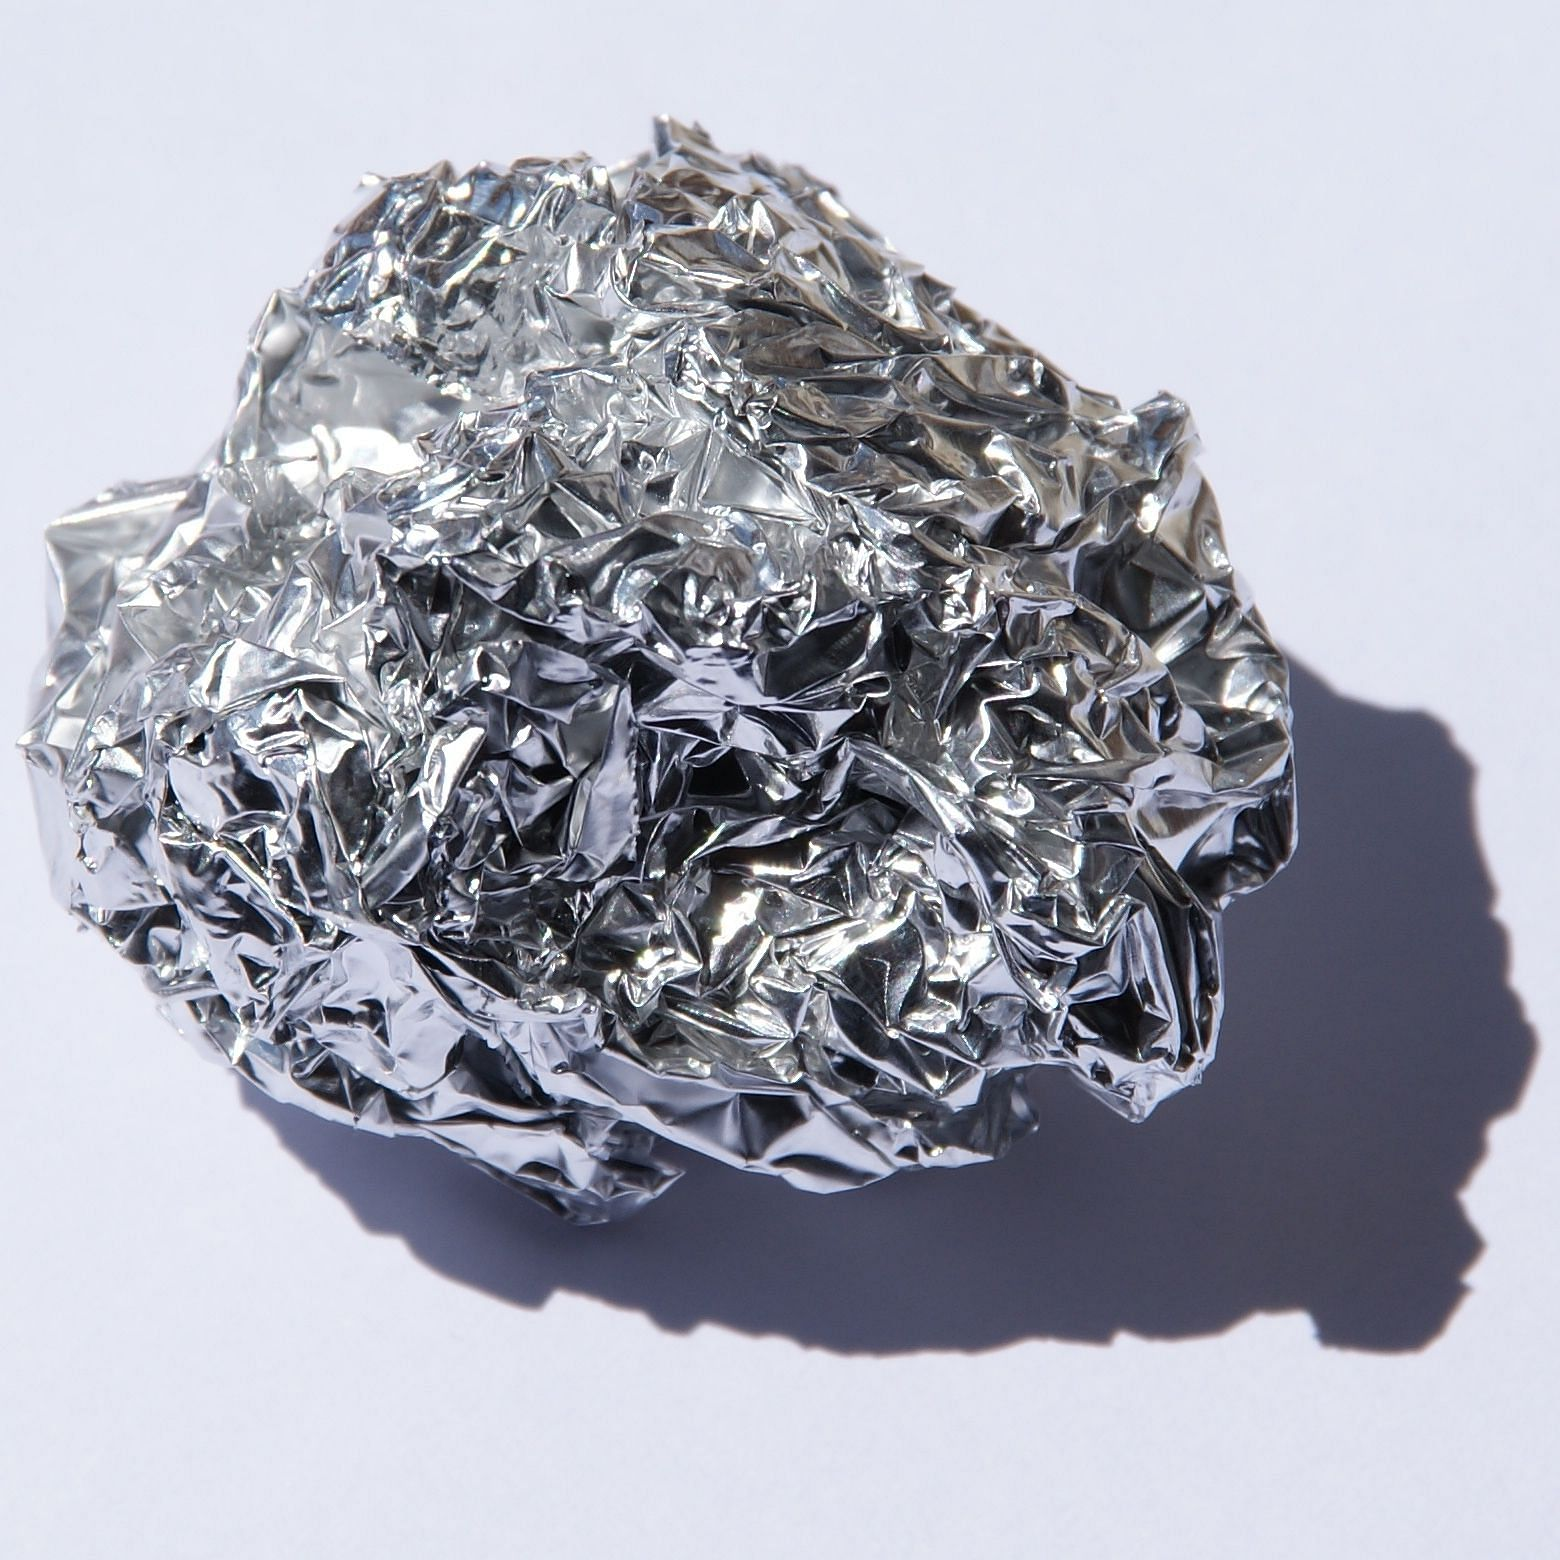 15 Reasons Why Every Household Needs Aluminium Foil Home Decor Singapore